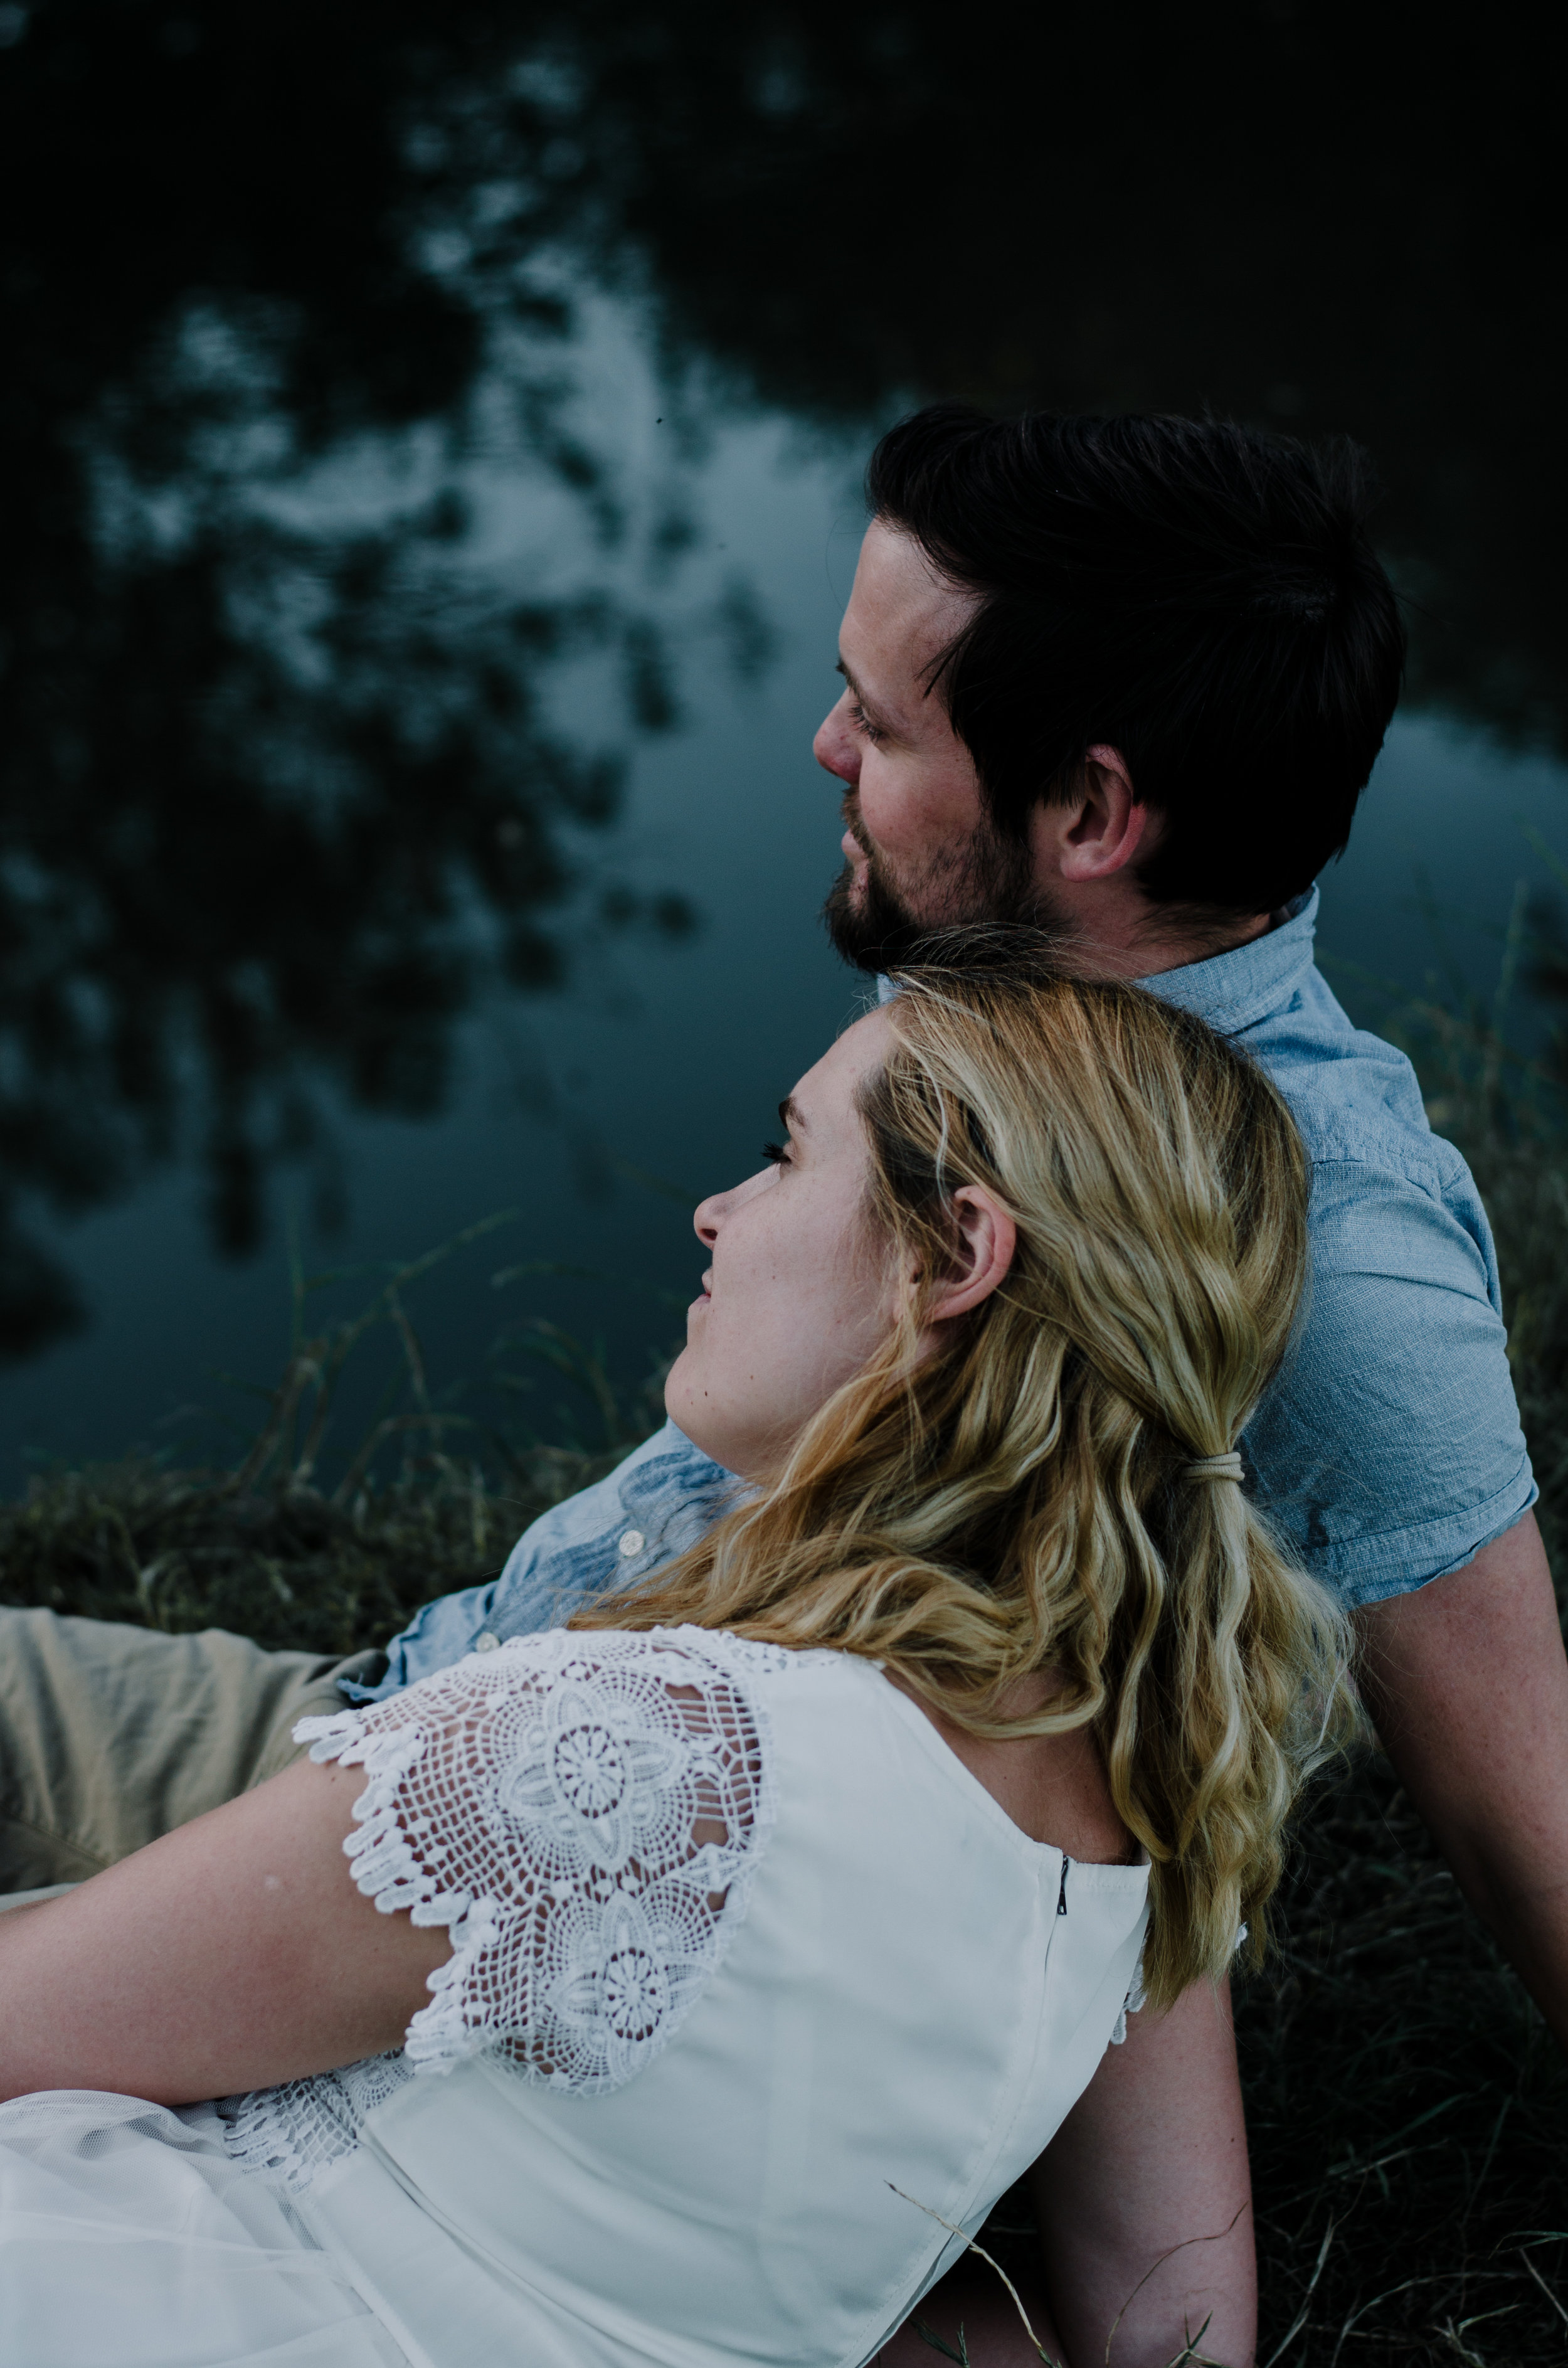 Gina & Chris - Barcombe Mills - Couple Session - Aiste Saulyte Photography-6.jpg